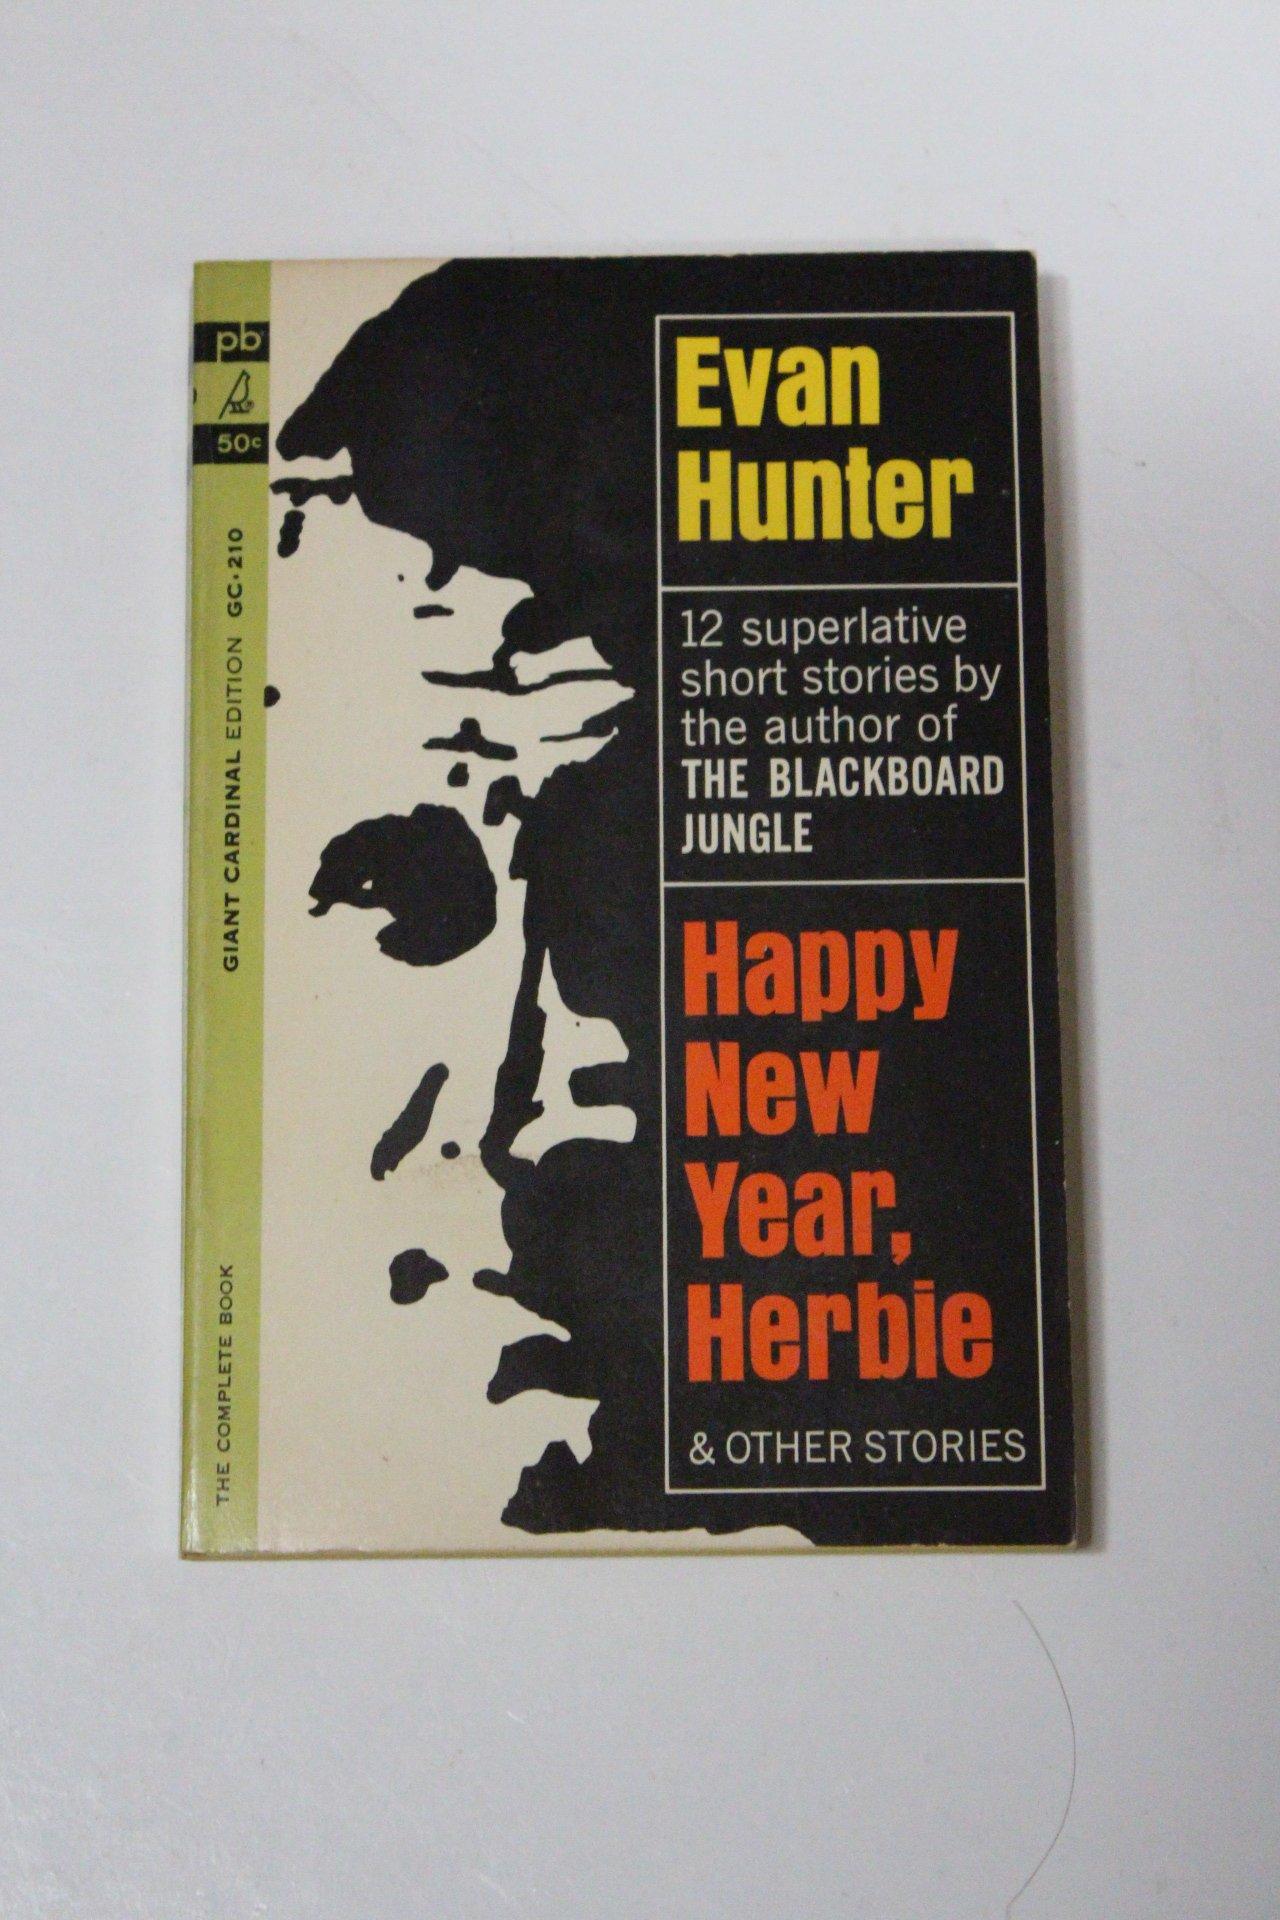 Happy New Year, Herbie & Other Stories: Evan Hunter: Amazon.com: Books